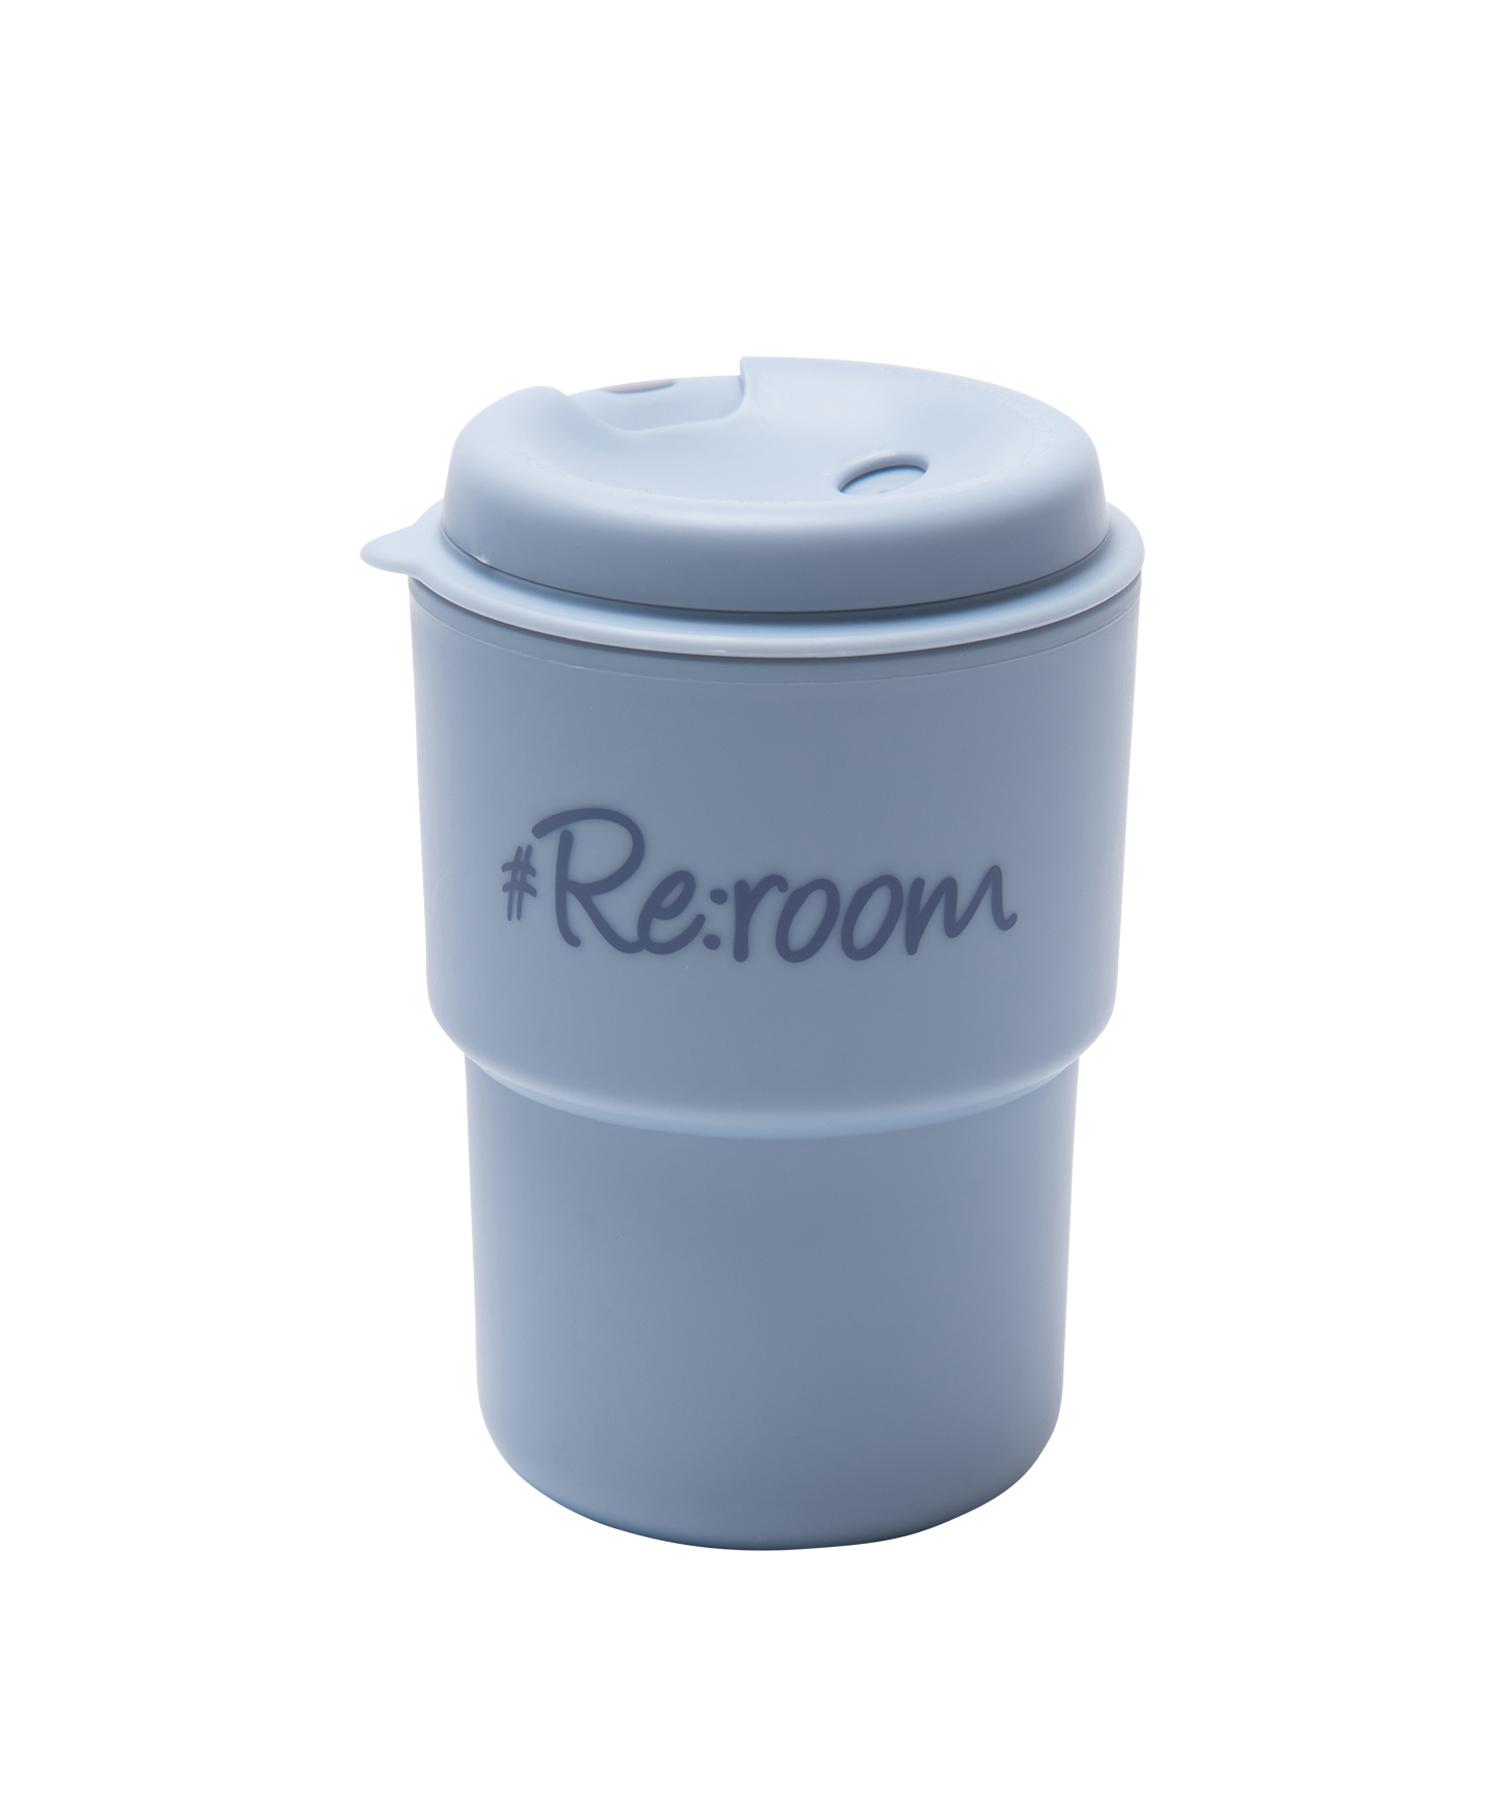 Re:room LOGO TUMBLER[REG059]